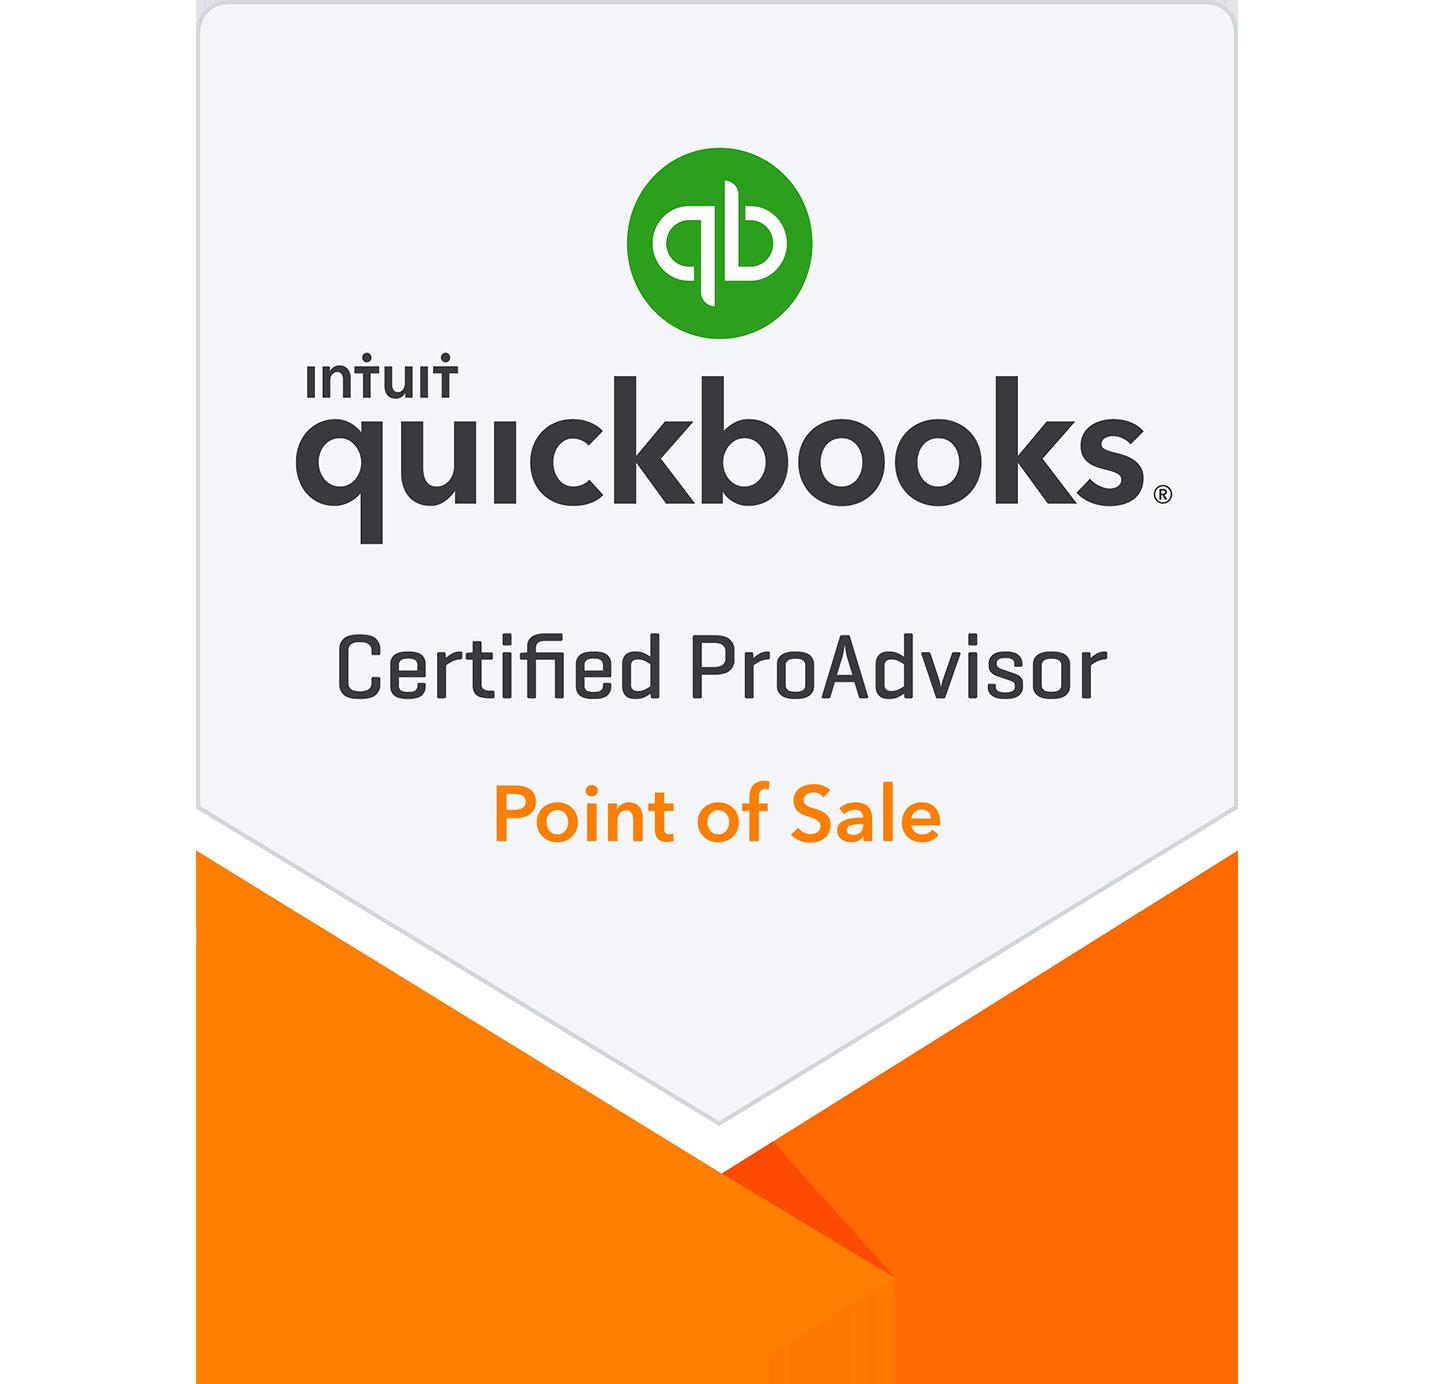 Point of Sale - Quickbooks Certified ProAdvisor